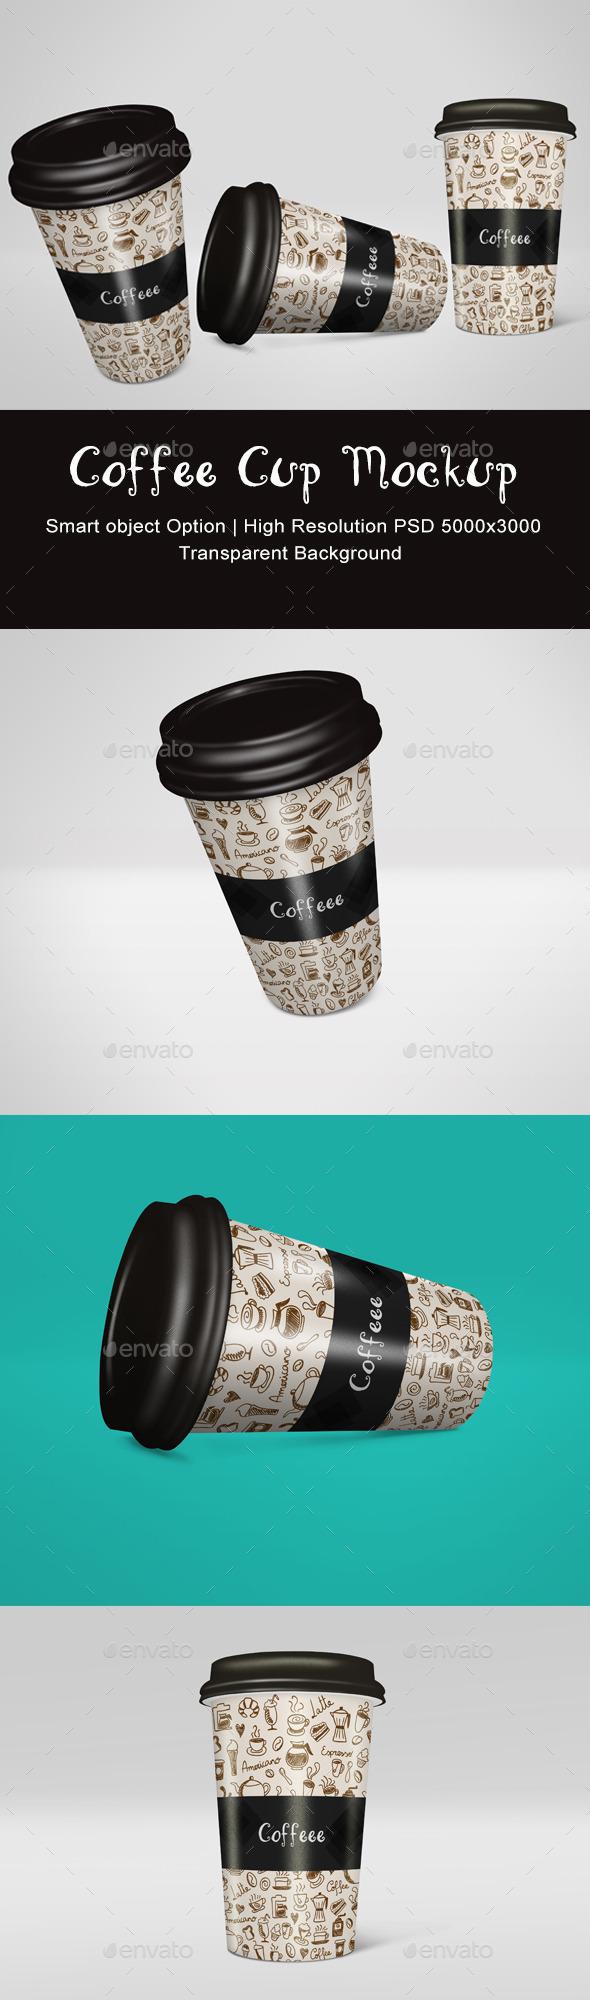 GraphicRiver Coffee Cup Mockup 11432200